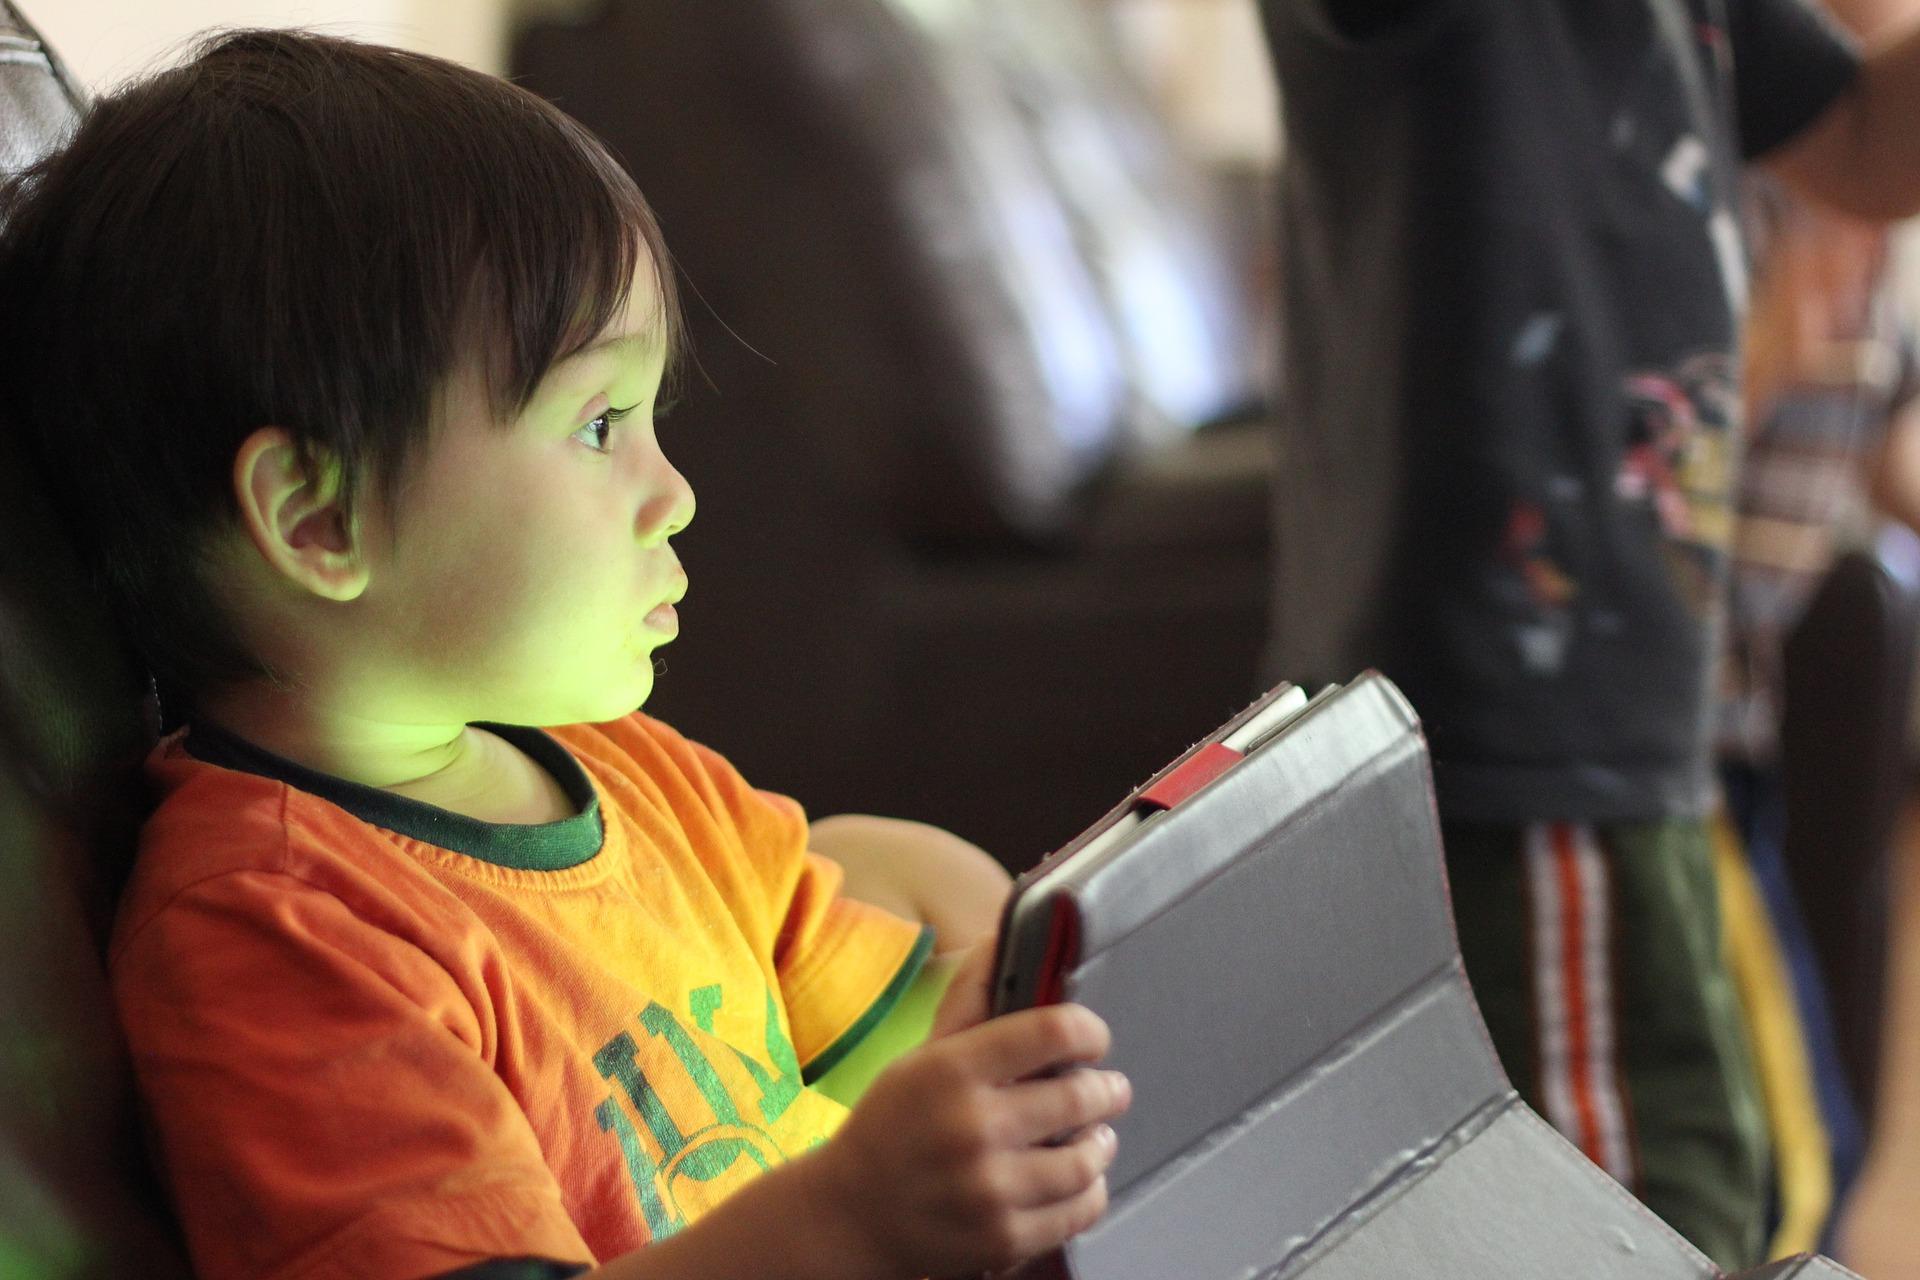 Digital Summer Time: How Do Kids Keep Busy?